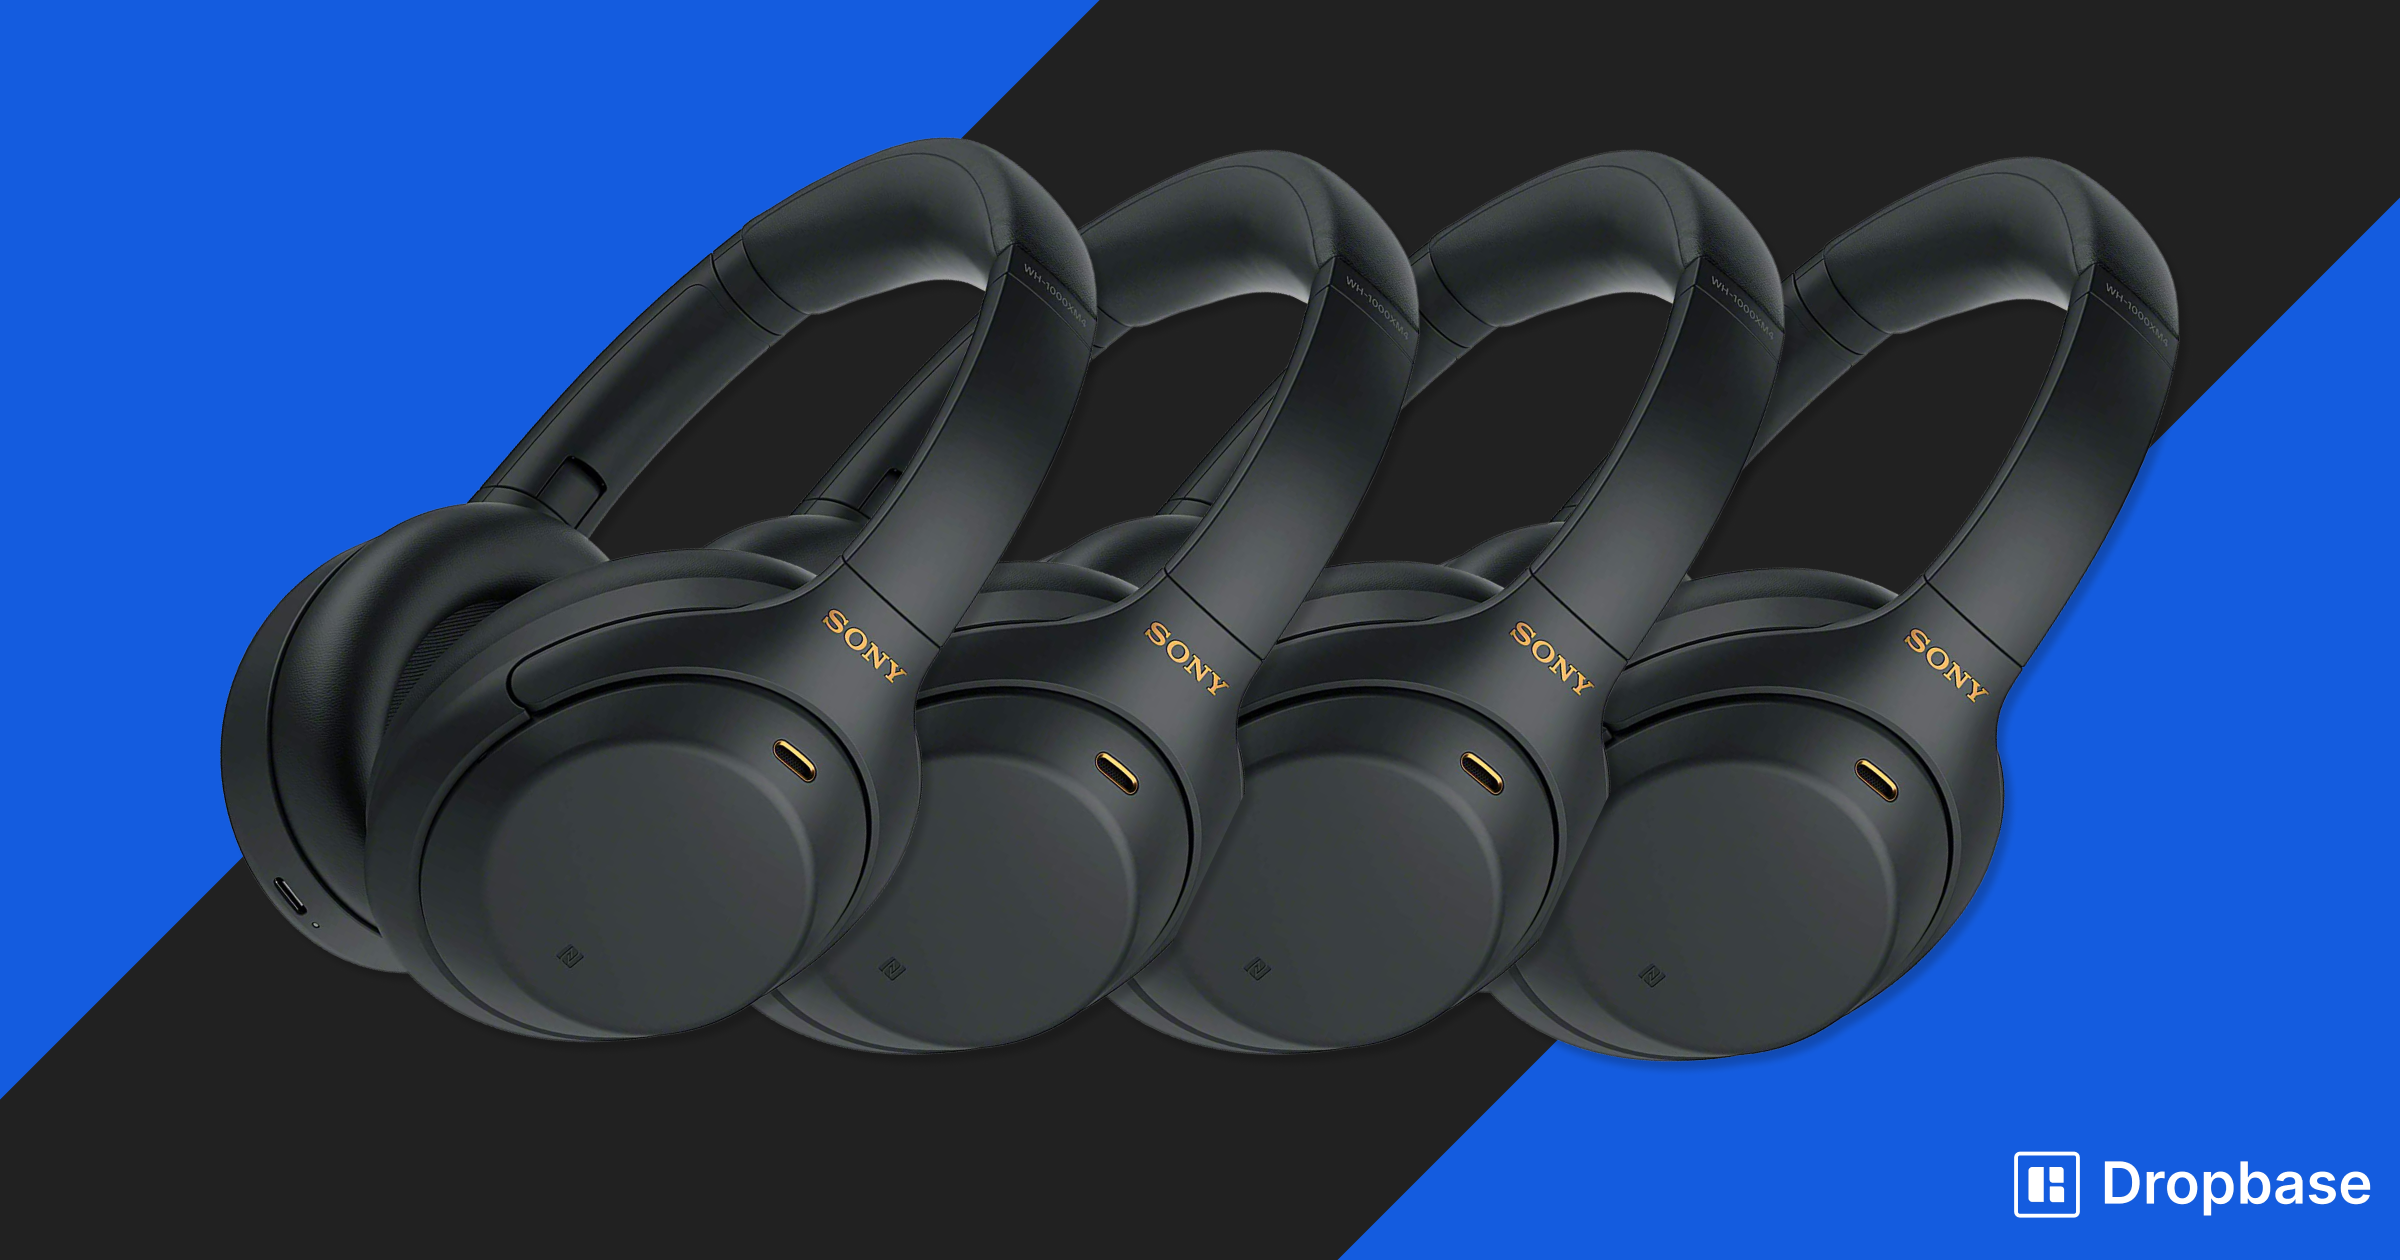 Dropbase API Challenge Prize: Sony XM4 Noise Cancelling Headphones